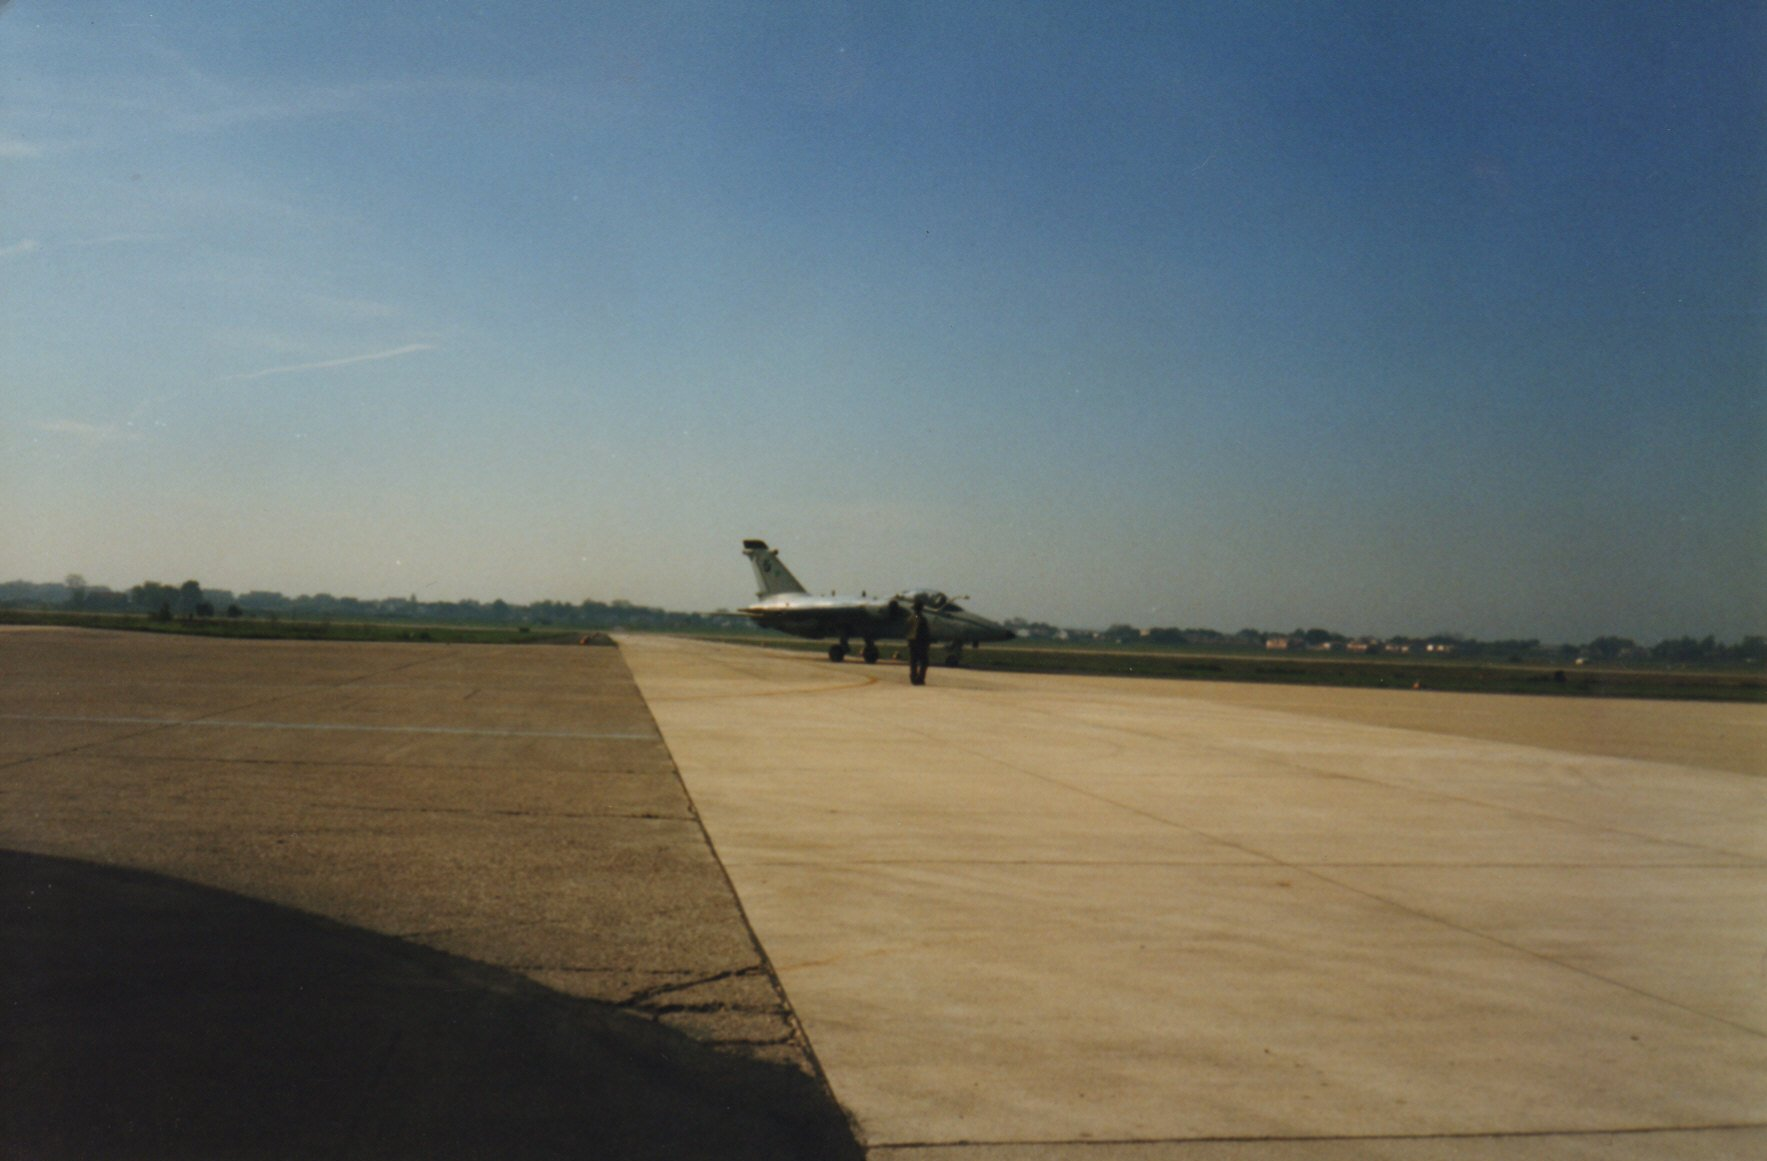 Military Aeronautics – Via Pratica di Mare - Hydrogen Deposit and Carabinieri Helicopter Centre